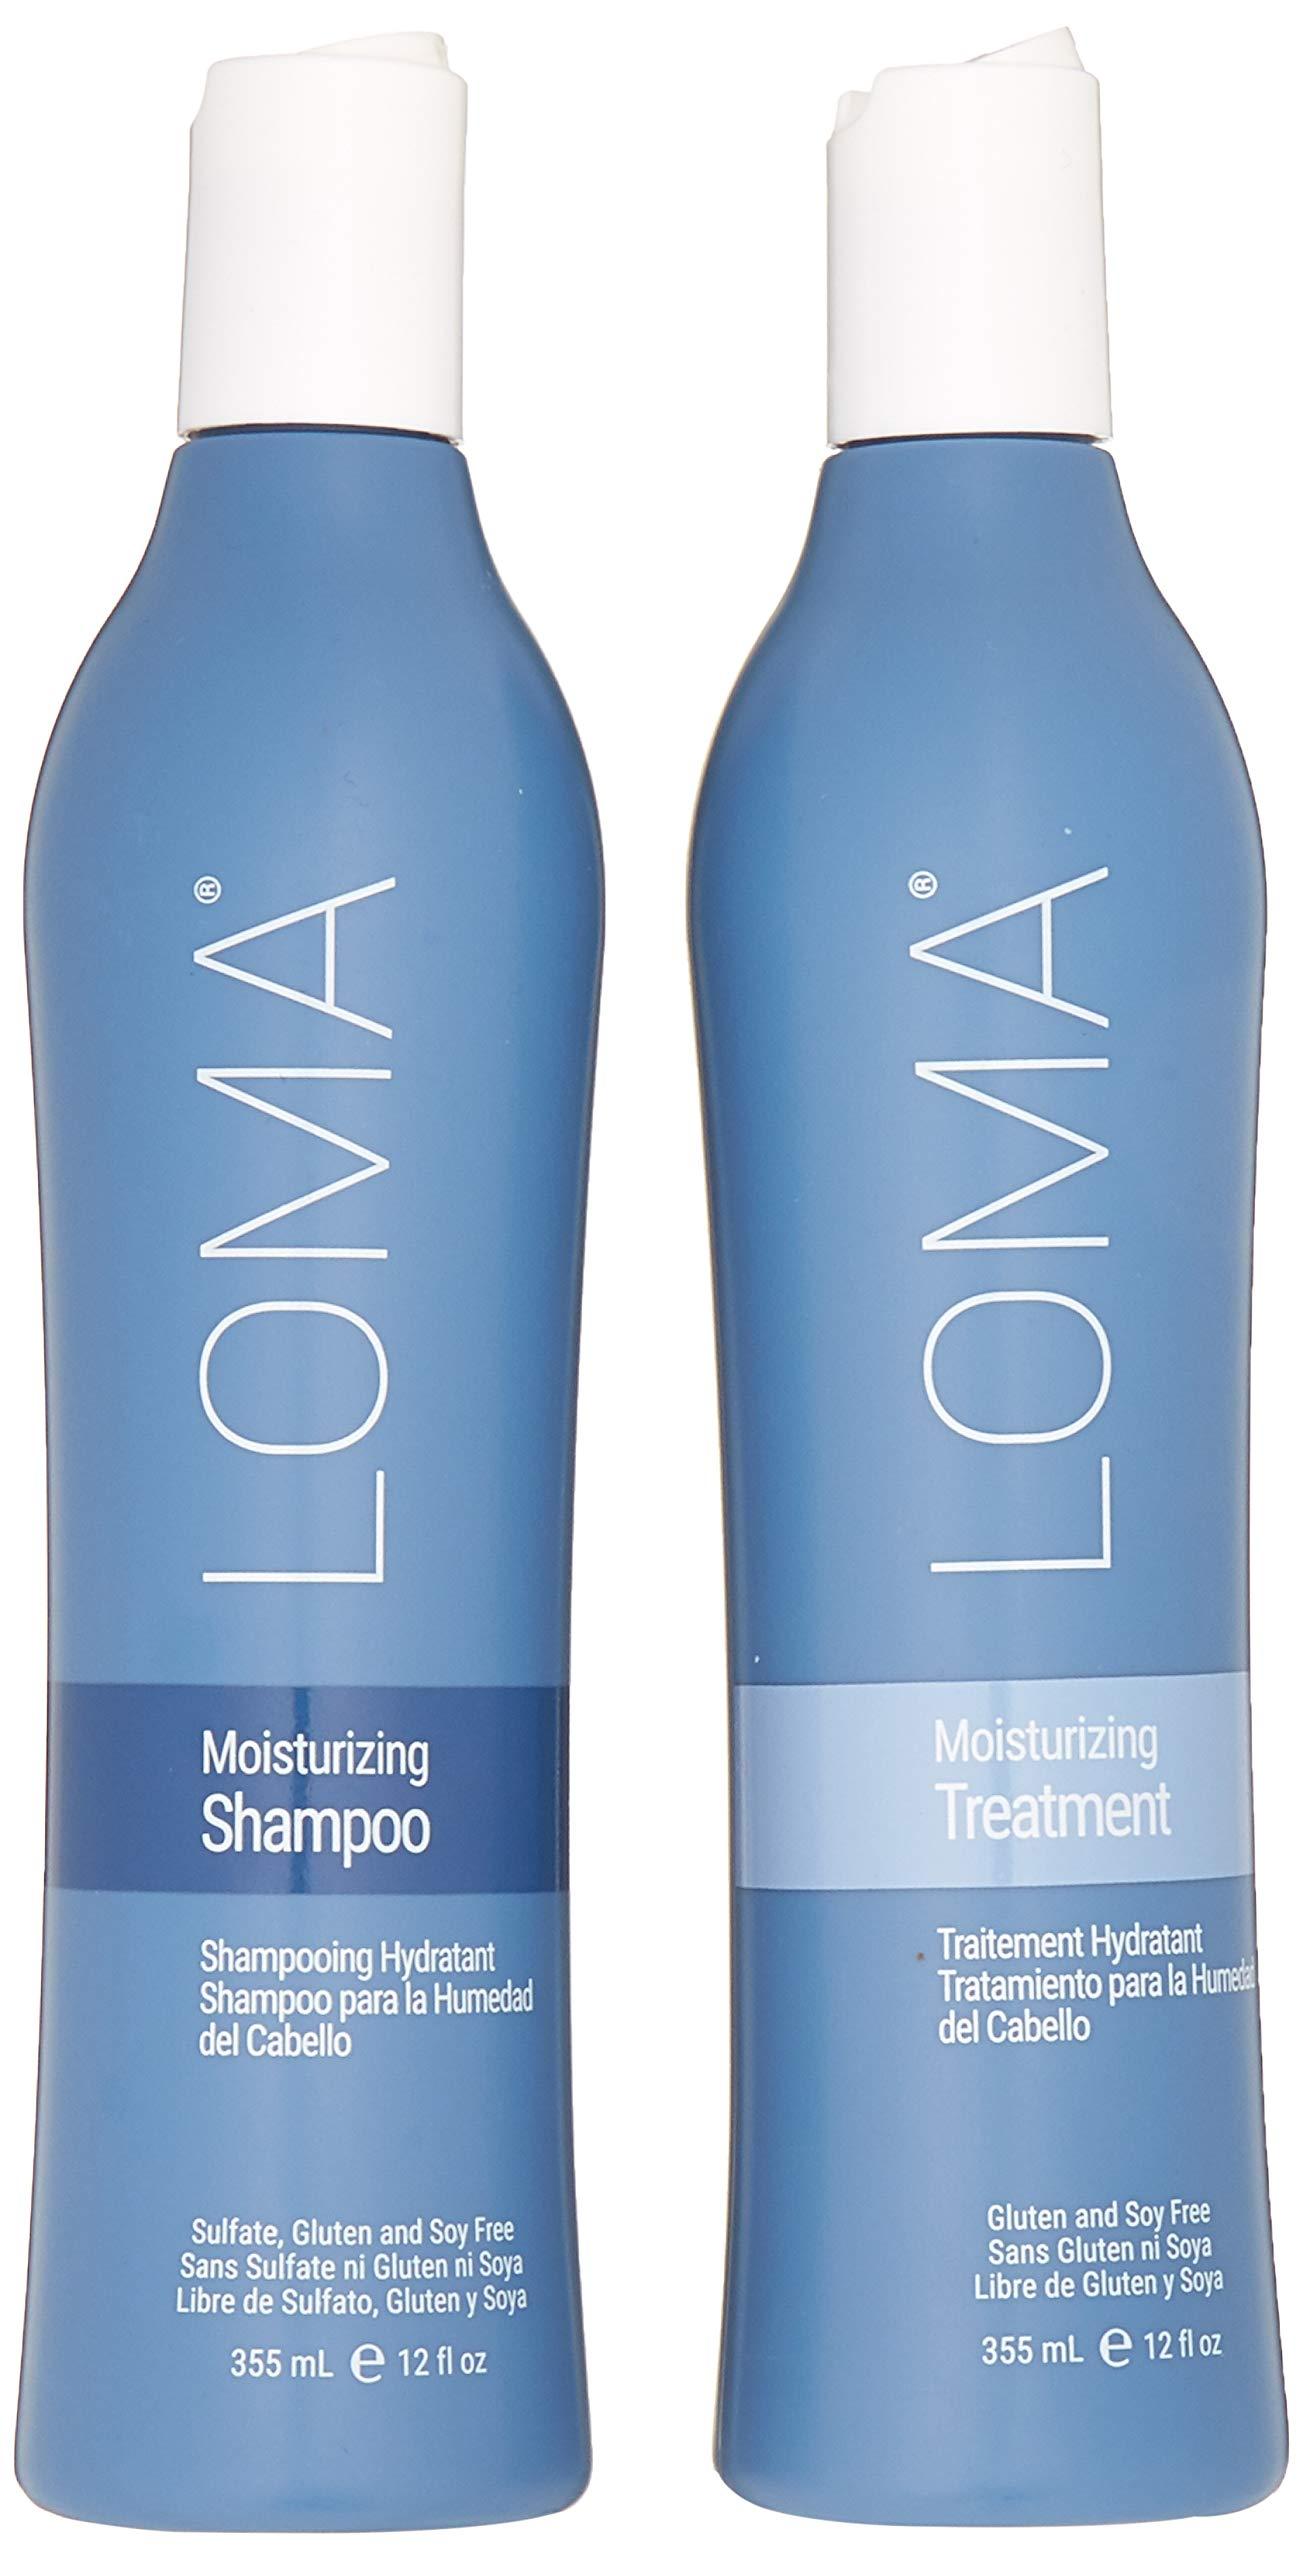 Loma Hair Care Moisturizing Shampoo Moisturizing Treatment Duo, 12 oz. by Loma Hair Care